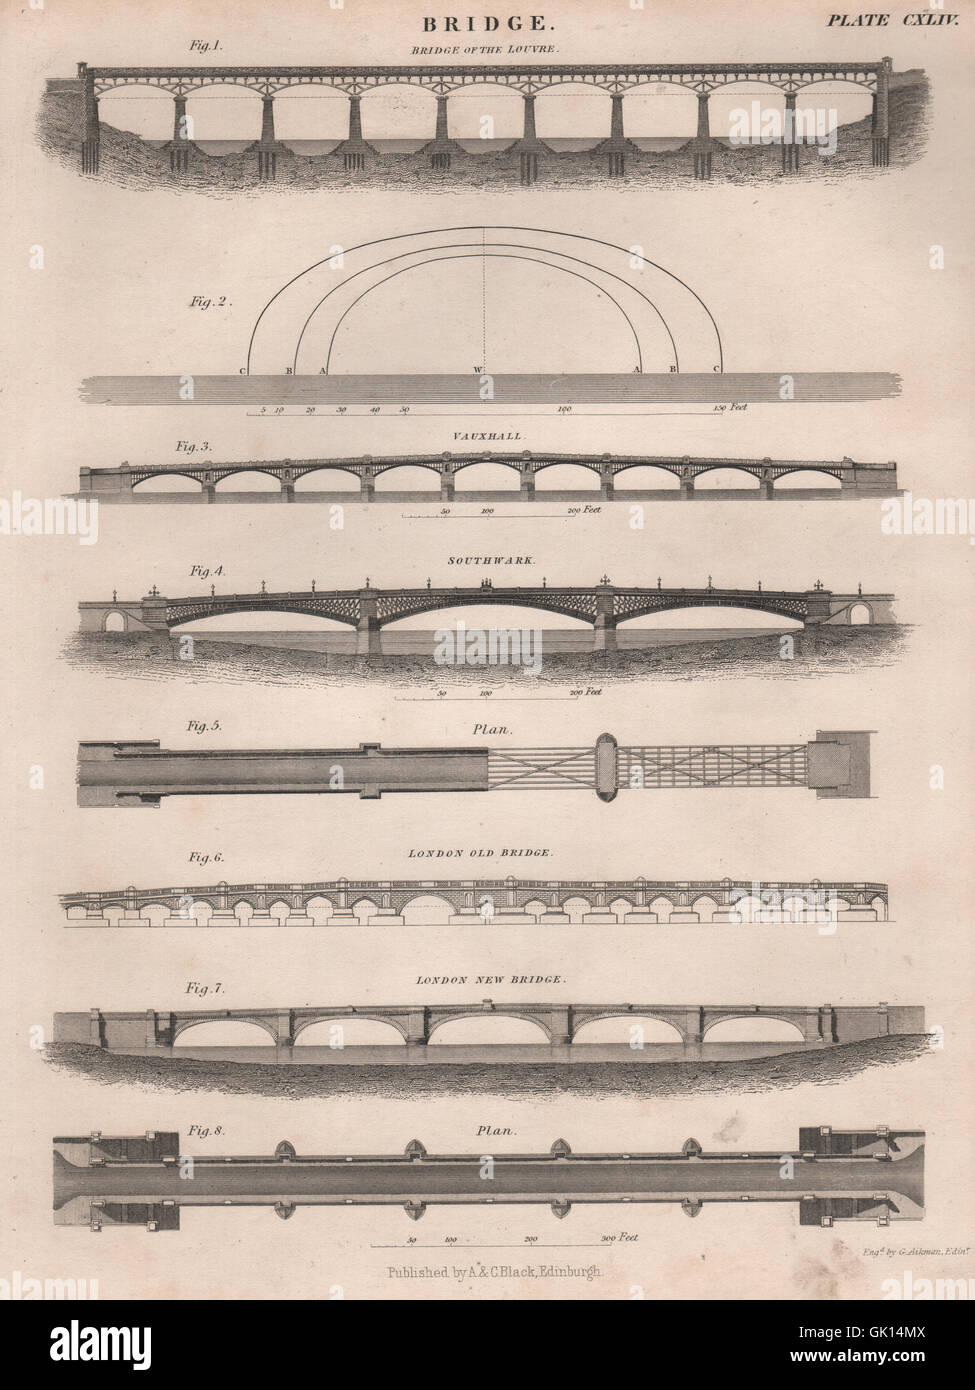 LONDON BRIDGES Vauxhall Southwark old & new London bridge. Louvre, print 1860 - Stock Image